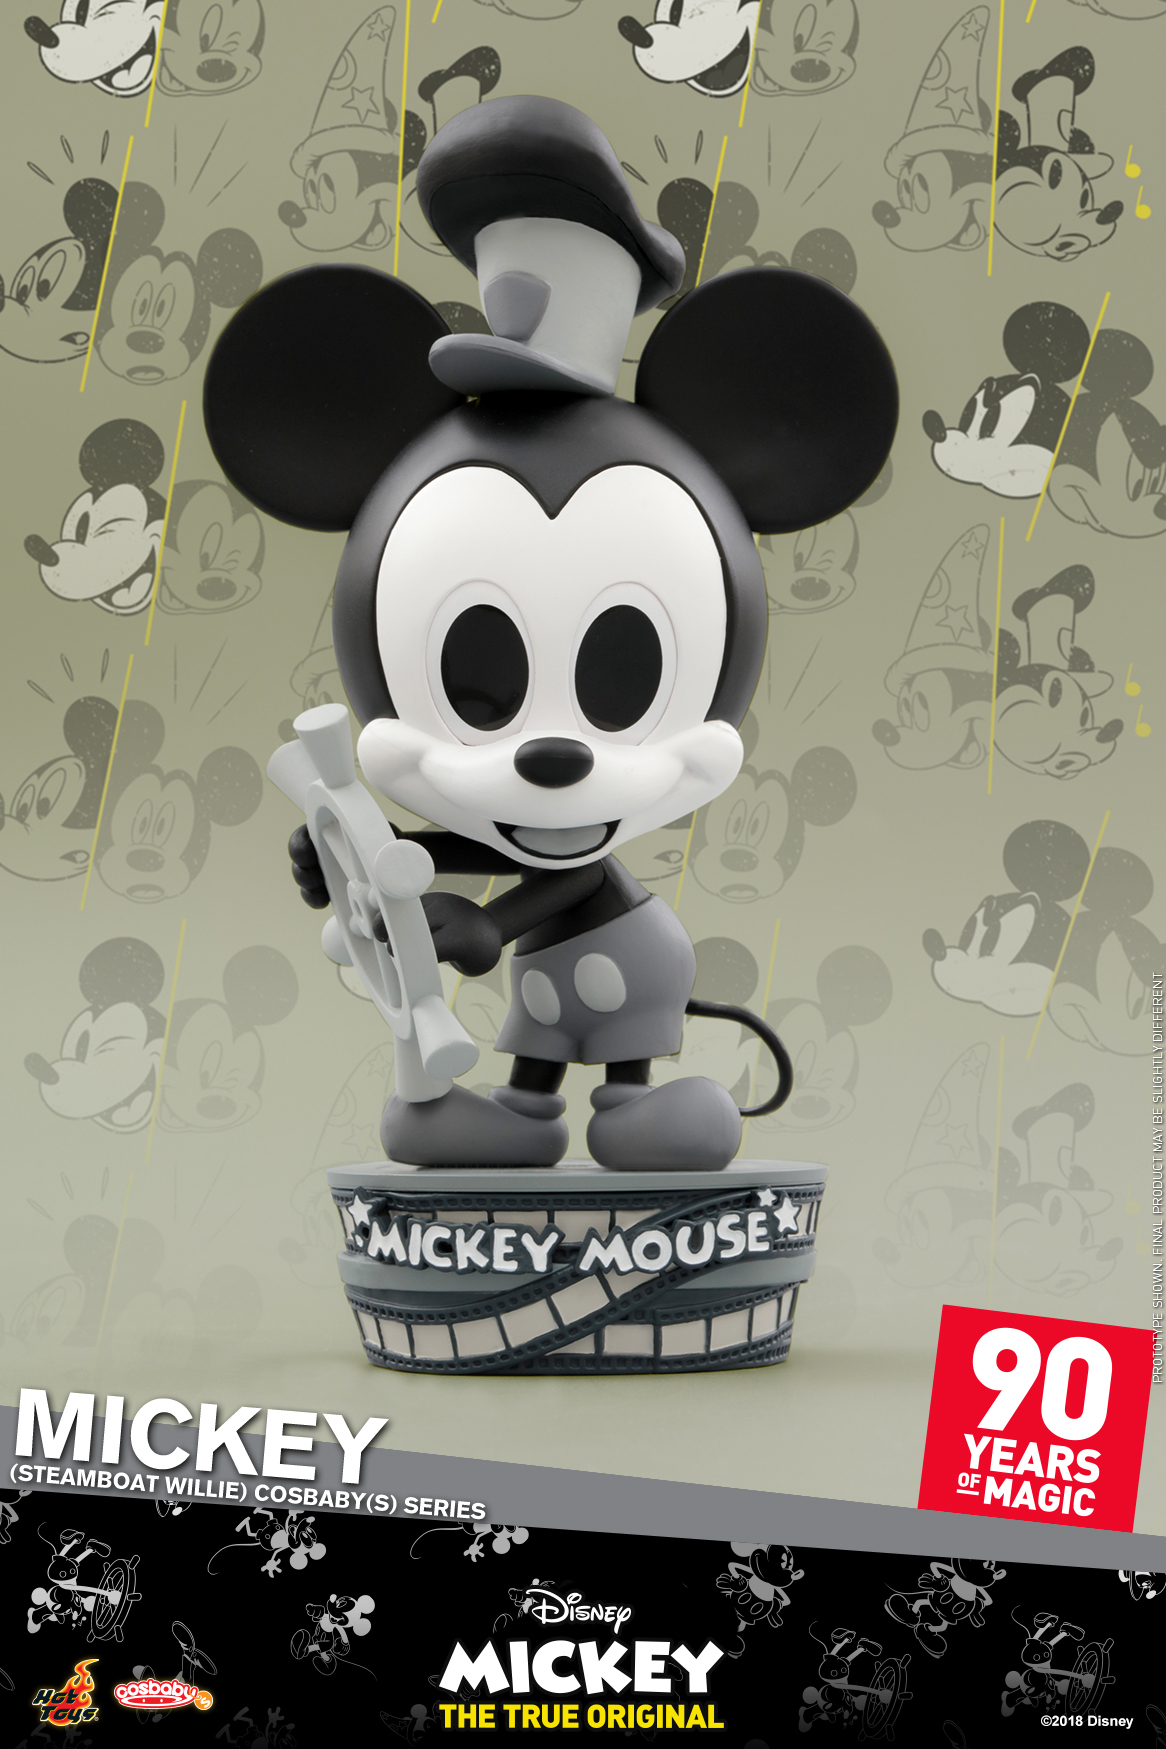 Mickey-(Steamboat-Willie)_V_02